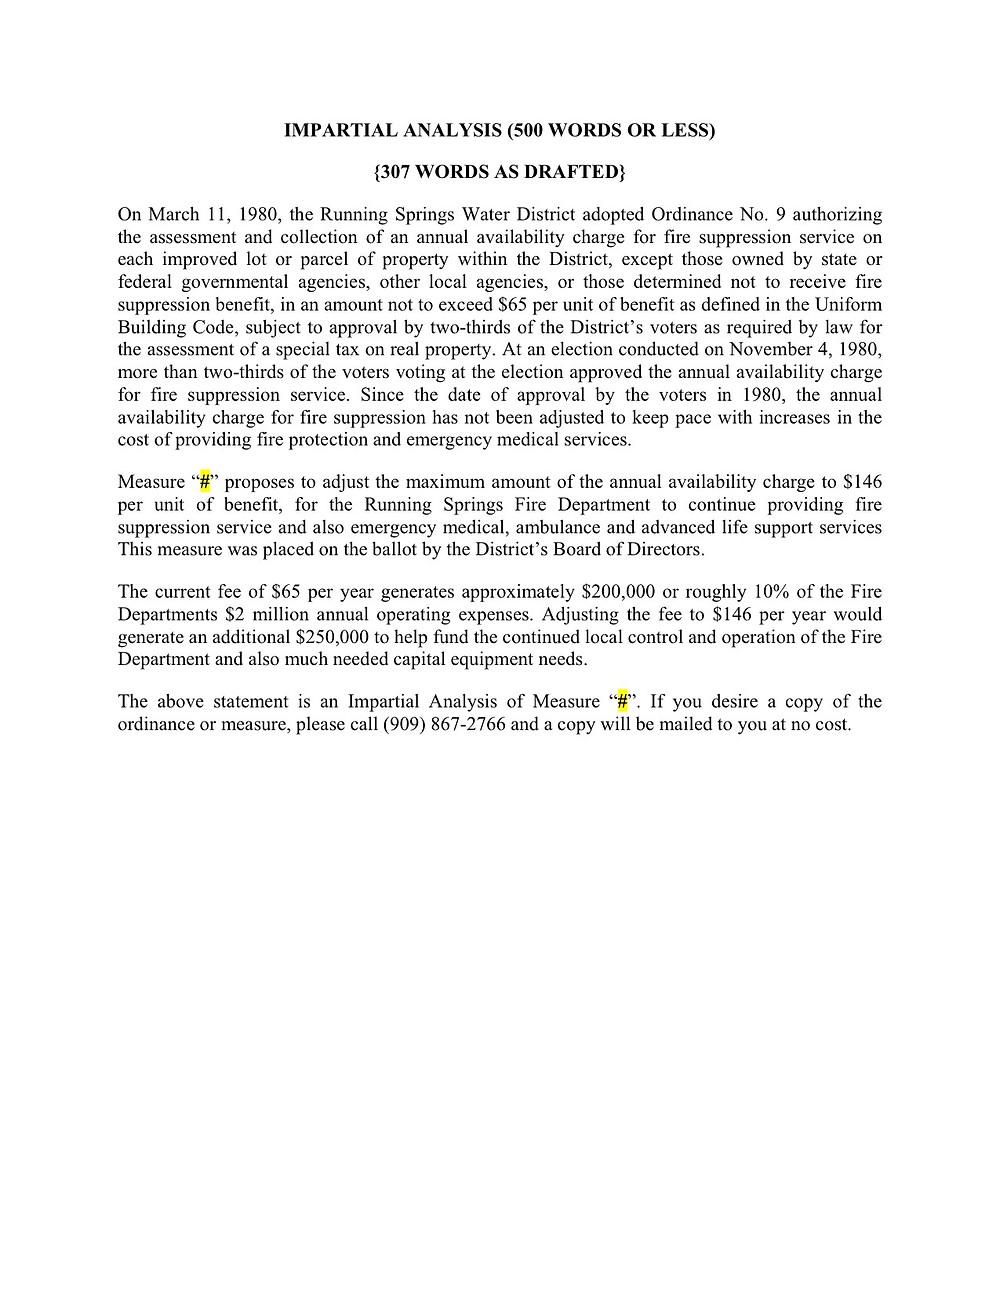 Impartial Analysis  - MEASURE B